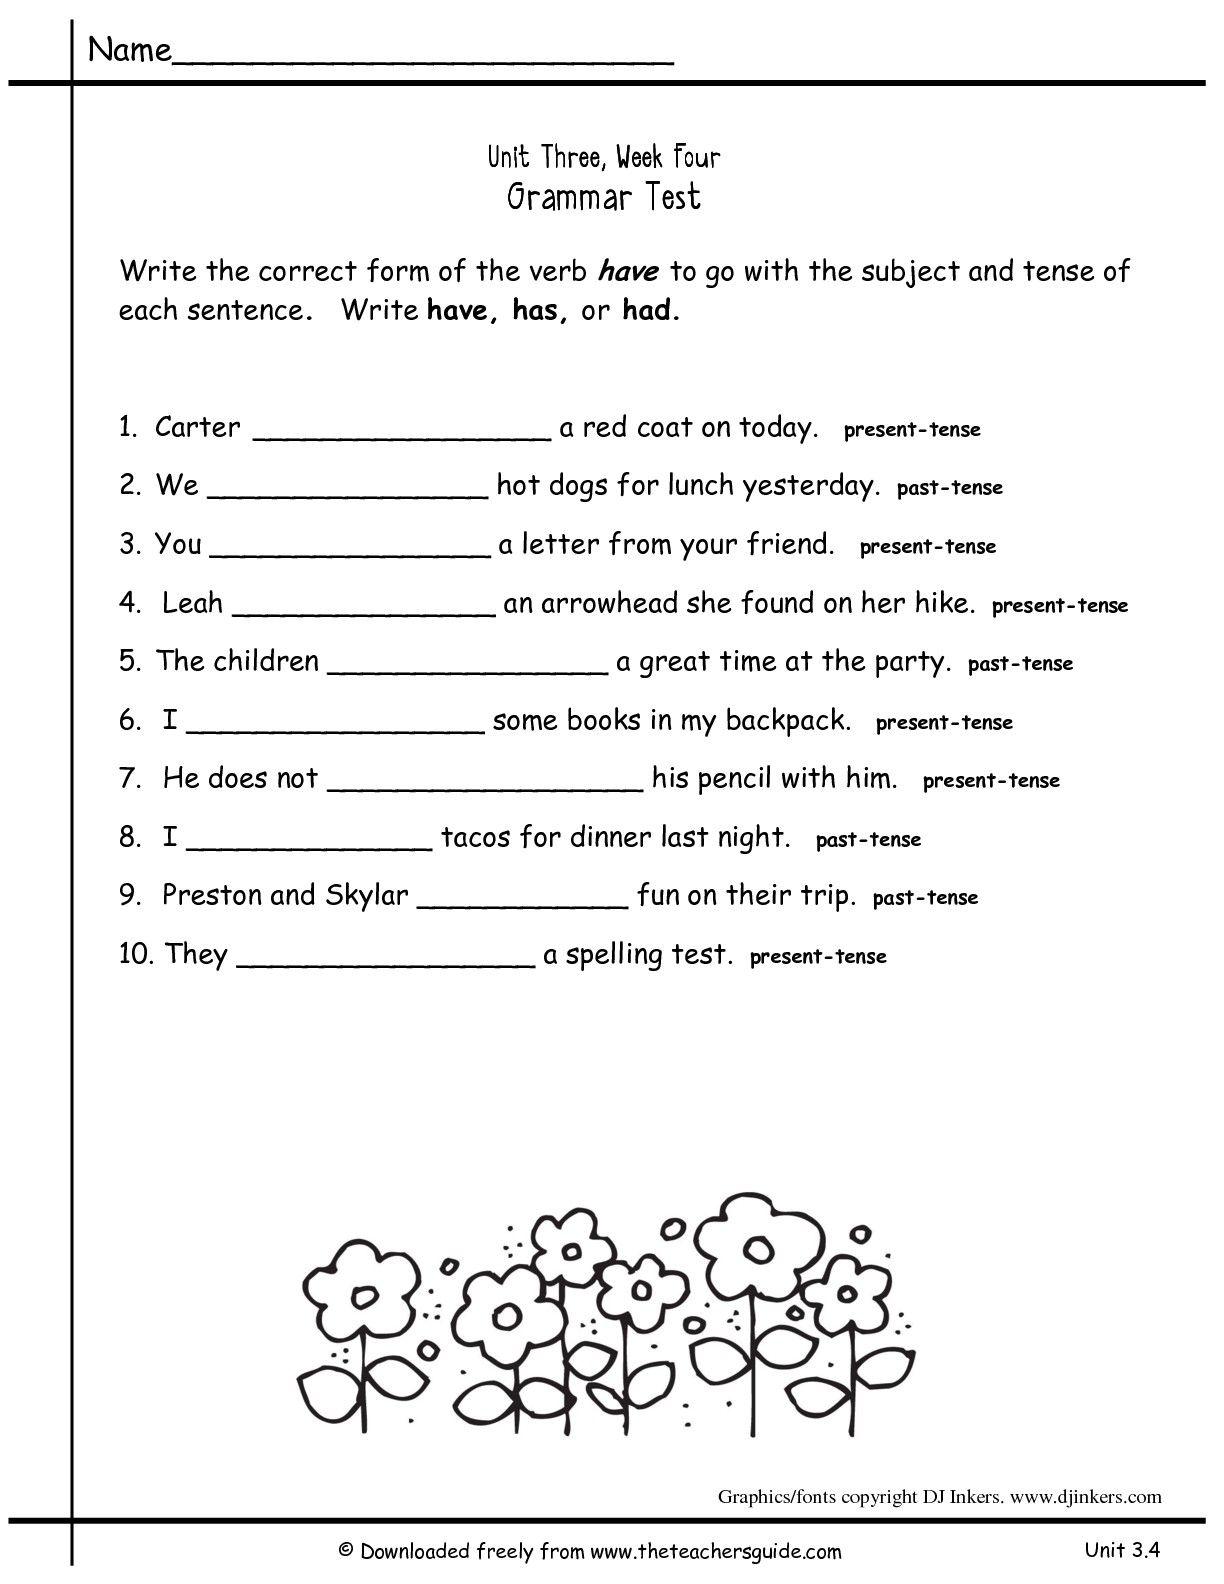 medium resolution of Noun Verb Agreement Worksheet   Printable Worksheets and Activities for  Teachers